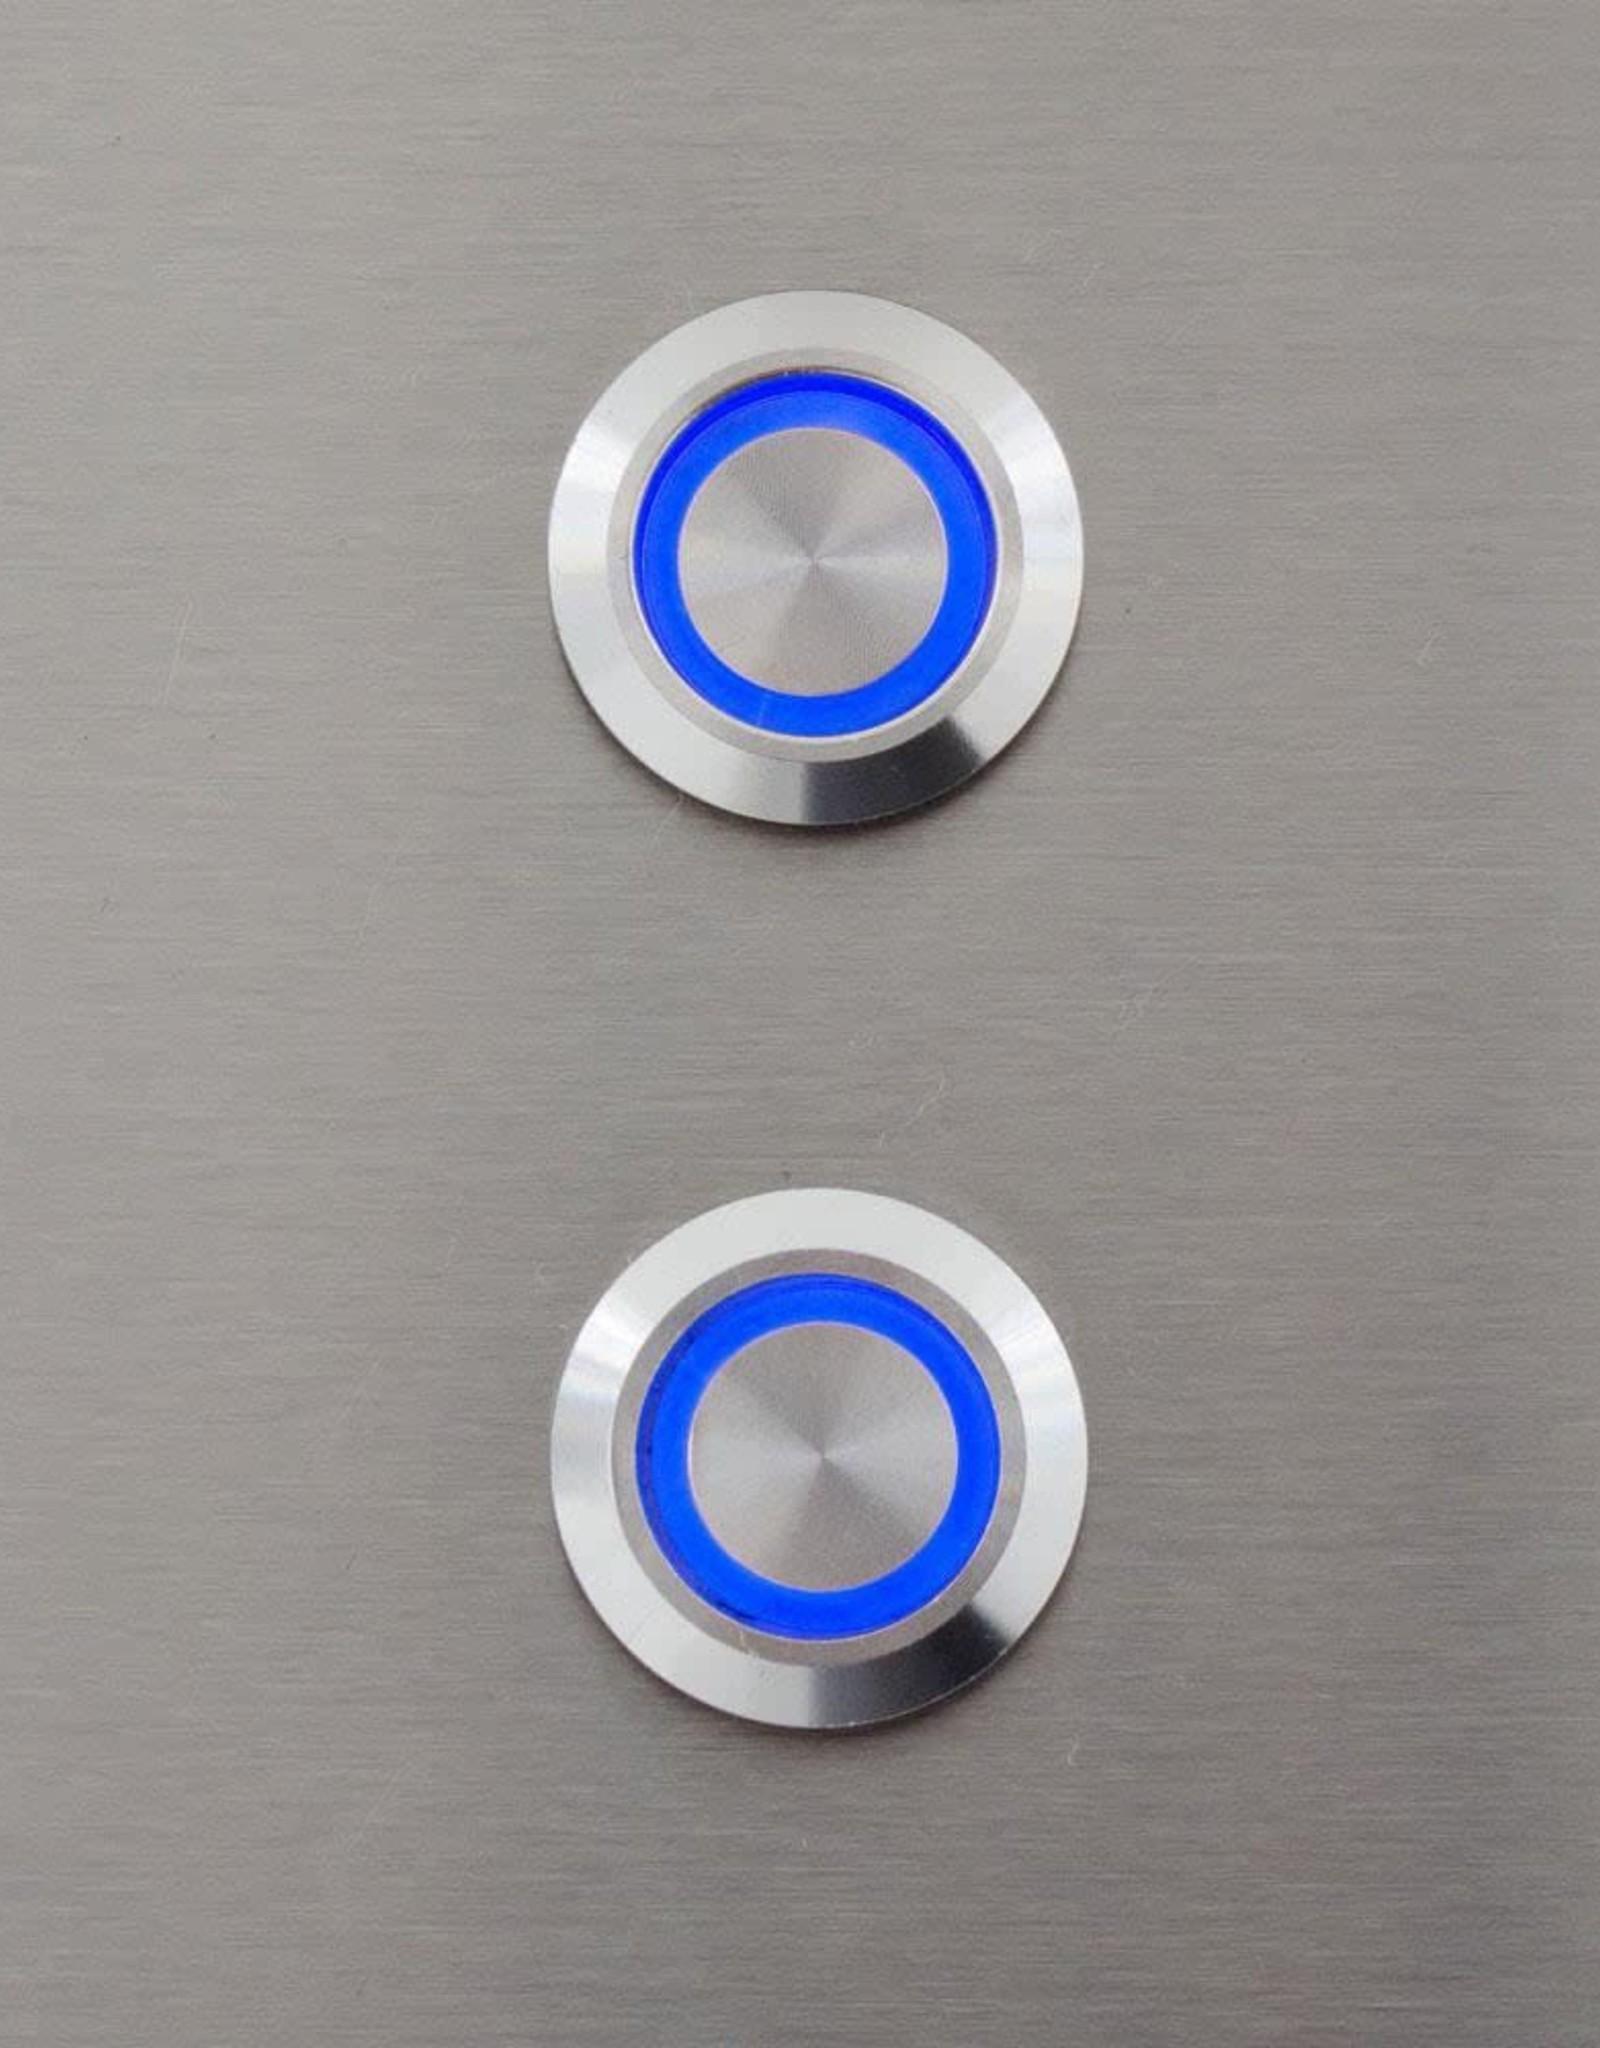 Blaze Outdoor Products Blaze Blue LED 8 Piece Set for 5LTE - BLZ-5LTELED-BLUE